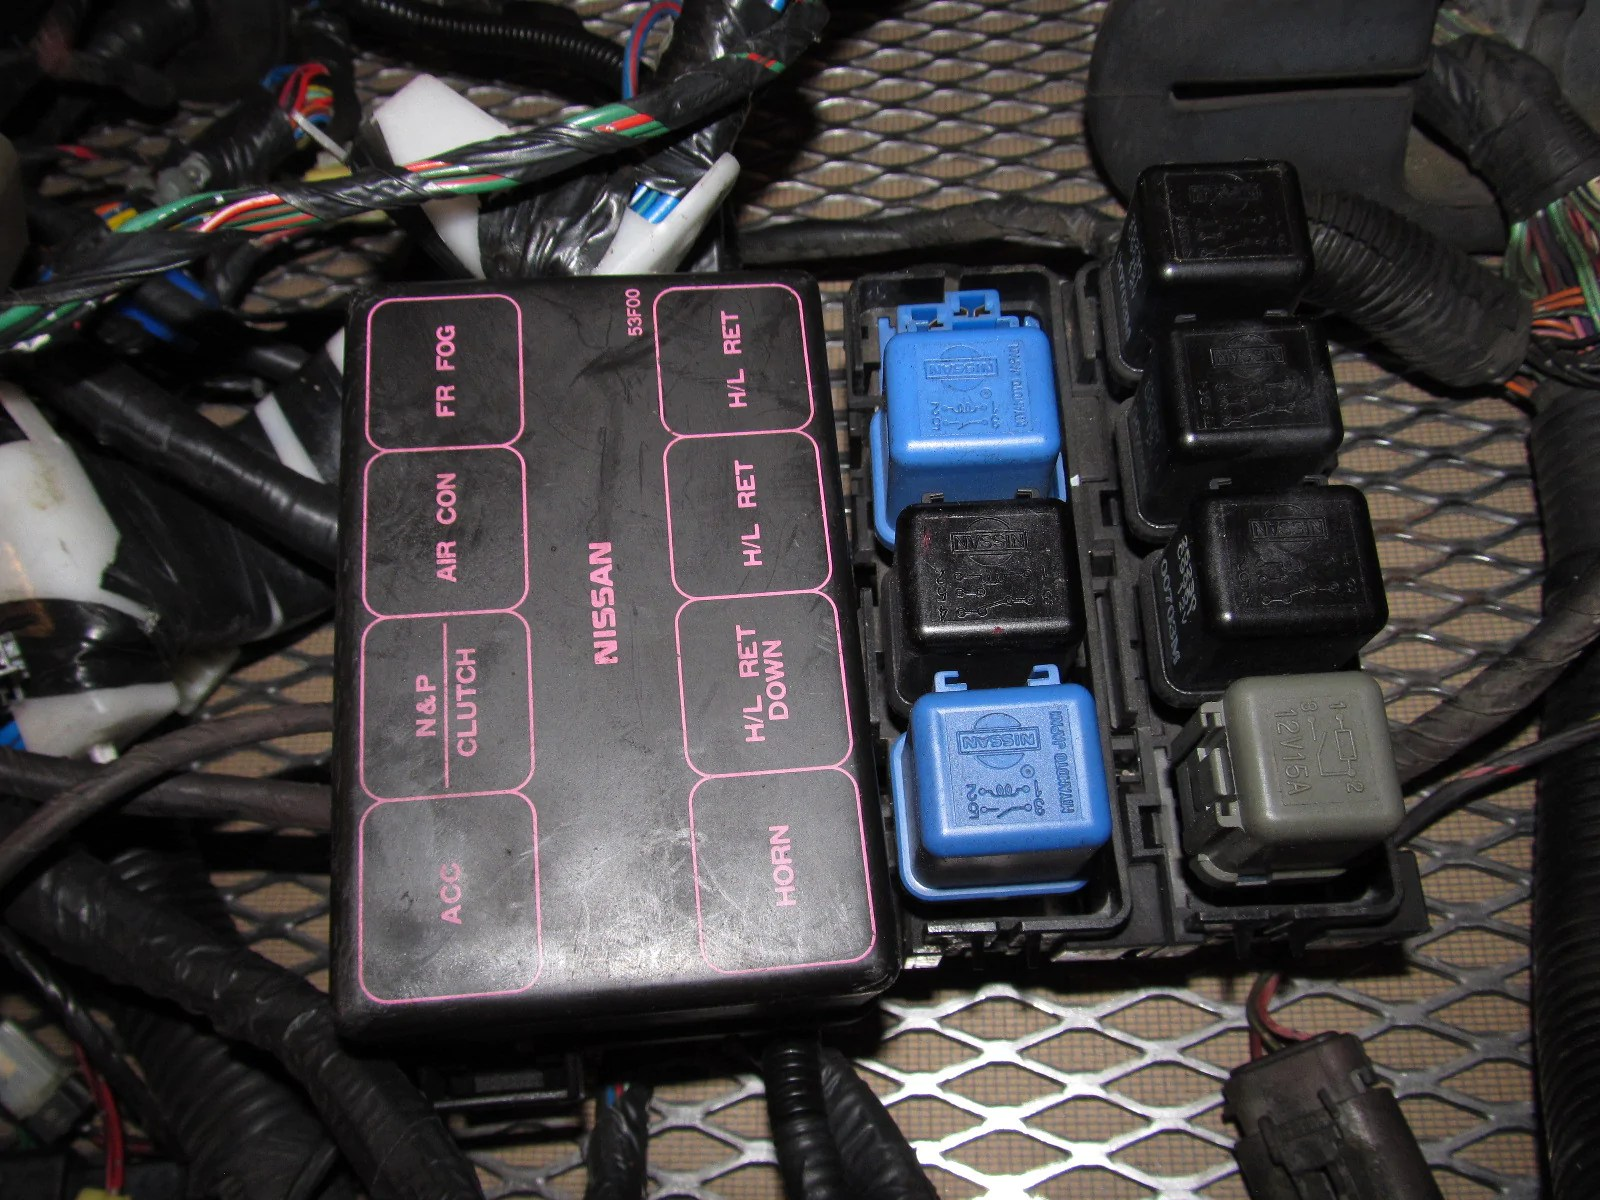 [DIAGRAM_3NM]  240sx Battery Fuse Box | Wiring Diagram | 240sx Fuse Box Battery |  | Wiring Diagram - Autoscout24